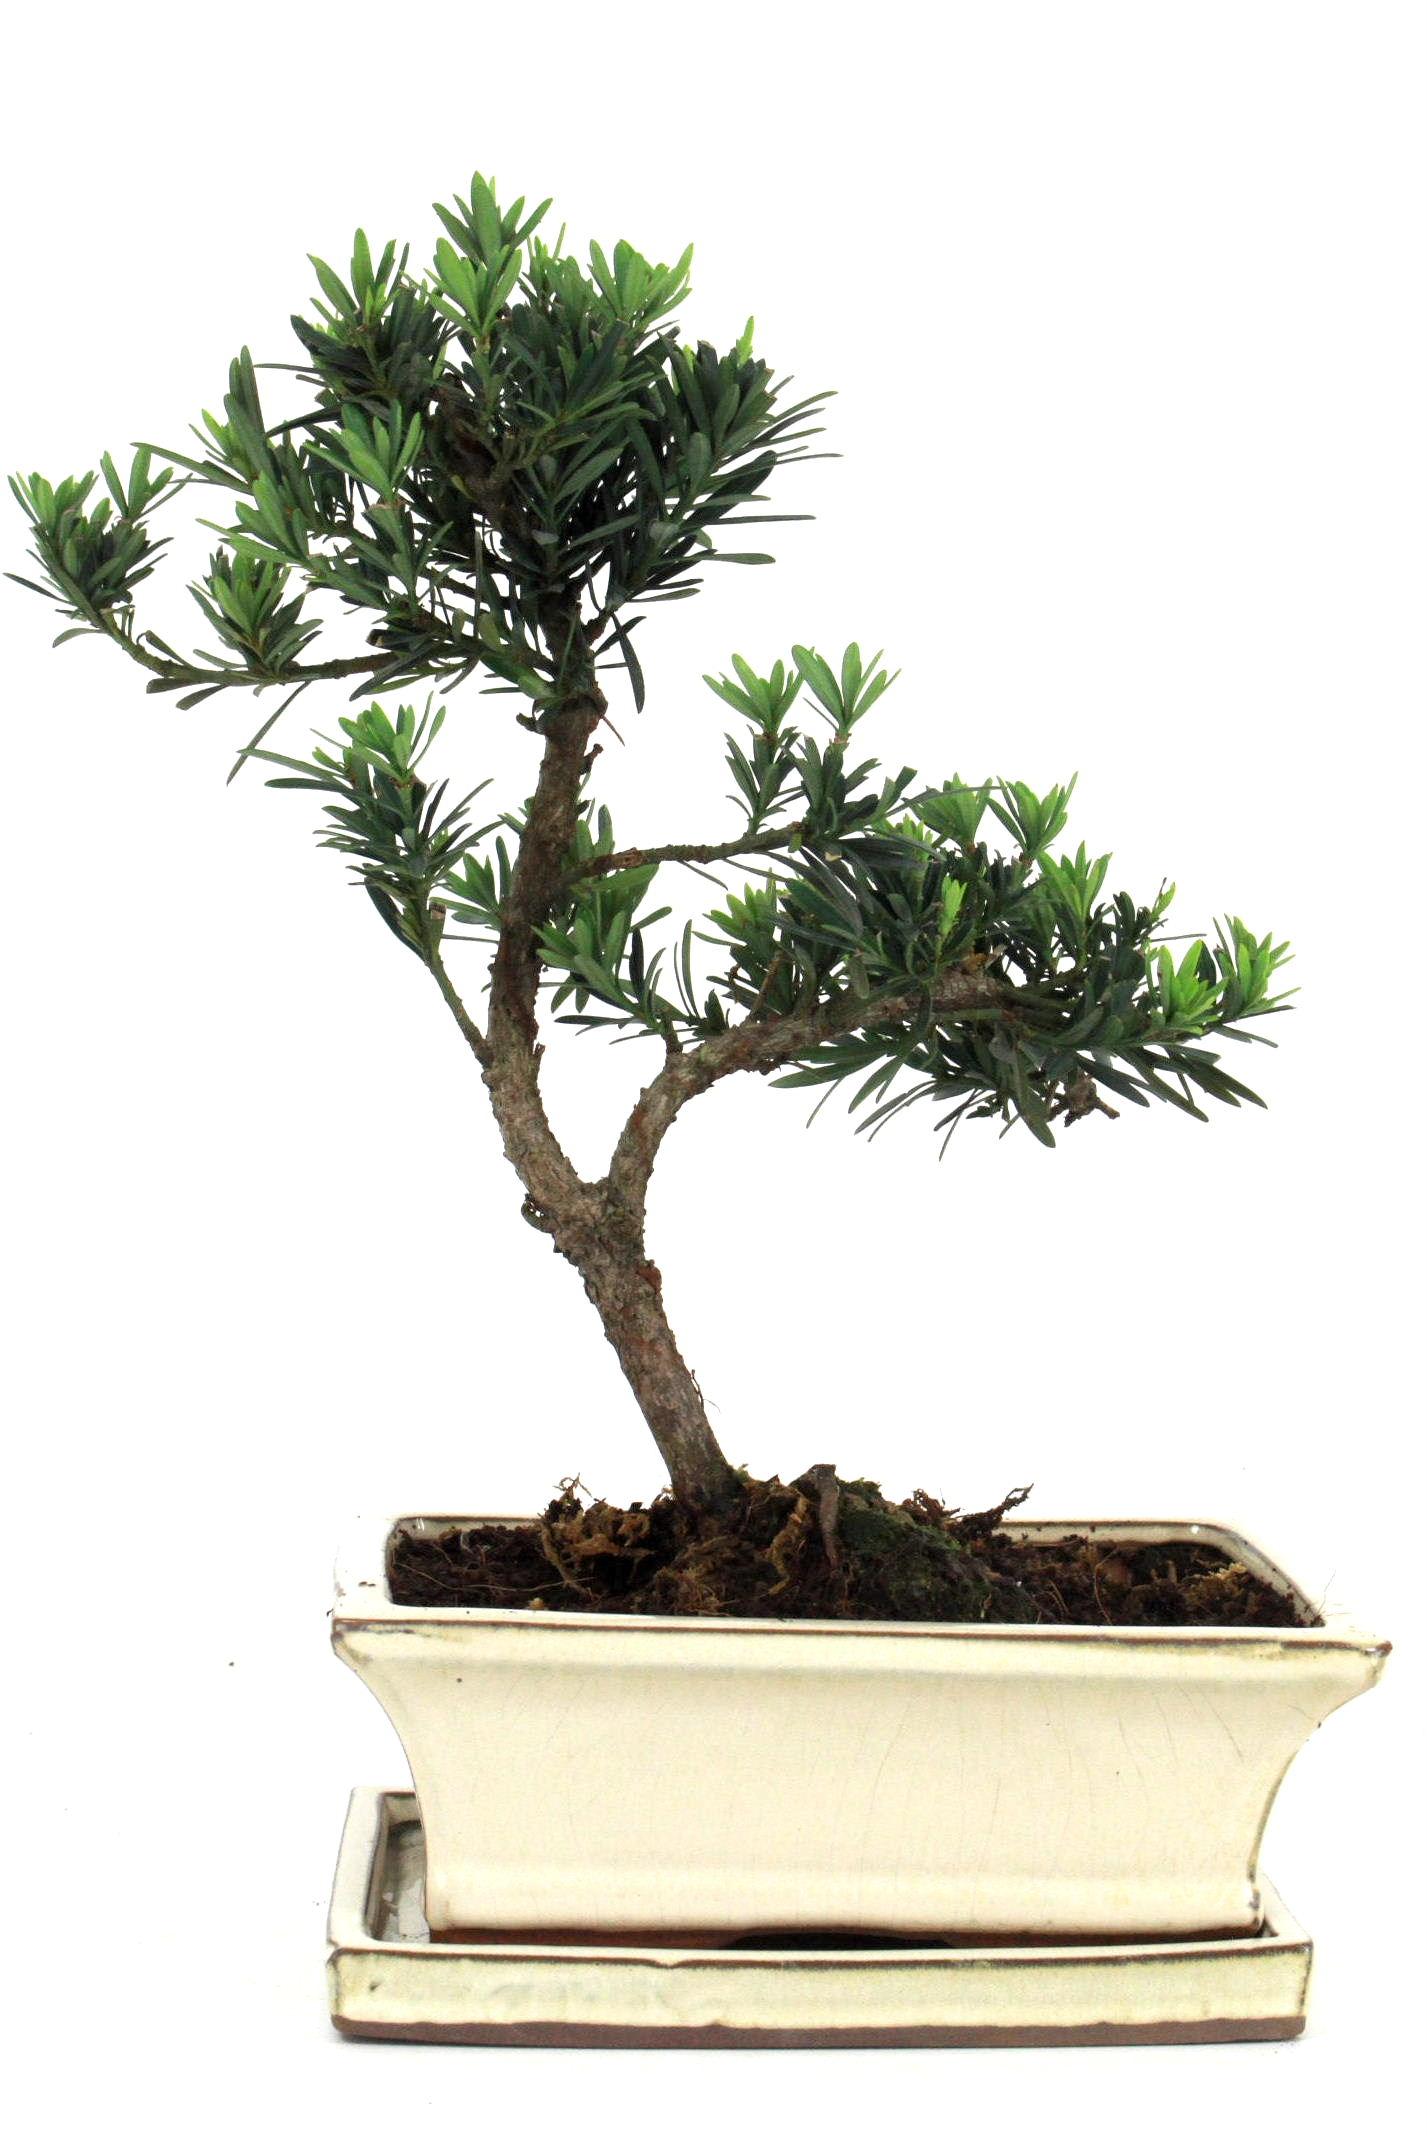 Steineibe bonsai 35 40 cm 1945 bei oyaki bonsai kaufen for Bonsai onlineshop